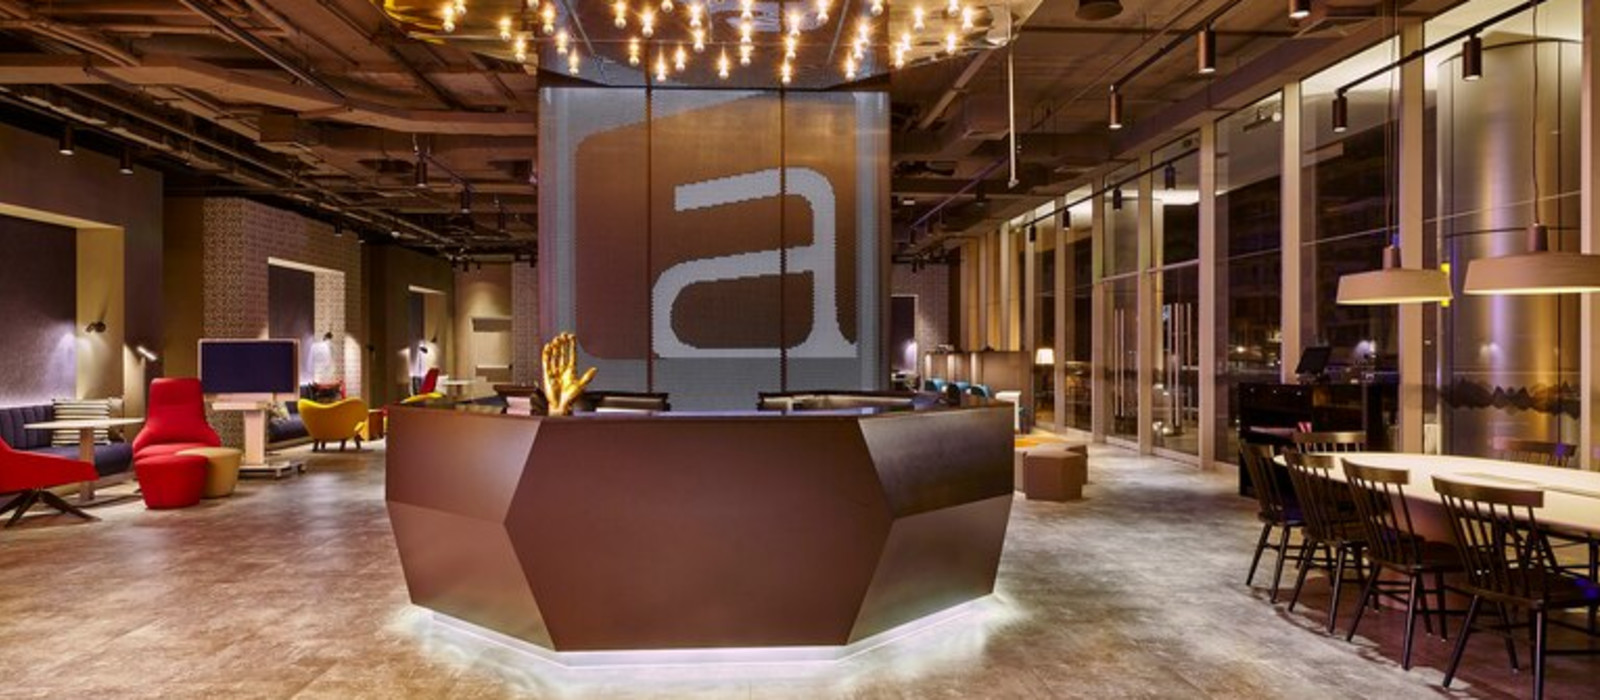 Hotel Aloft Lima Miraflores Peru